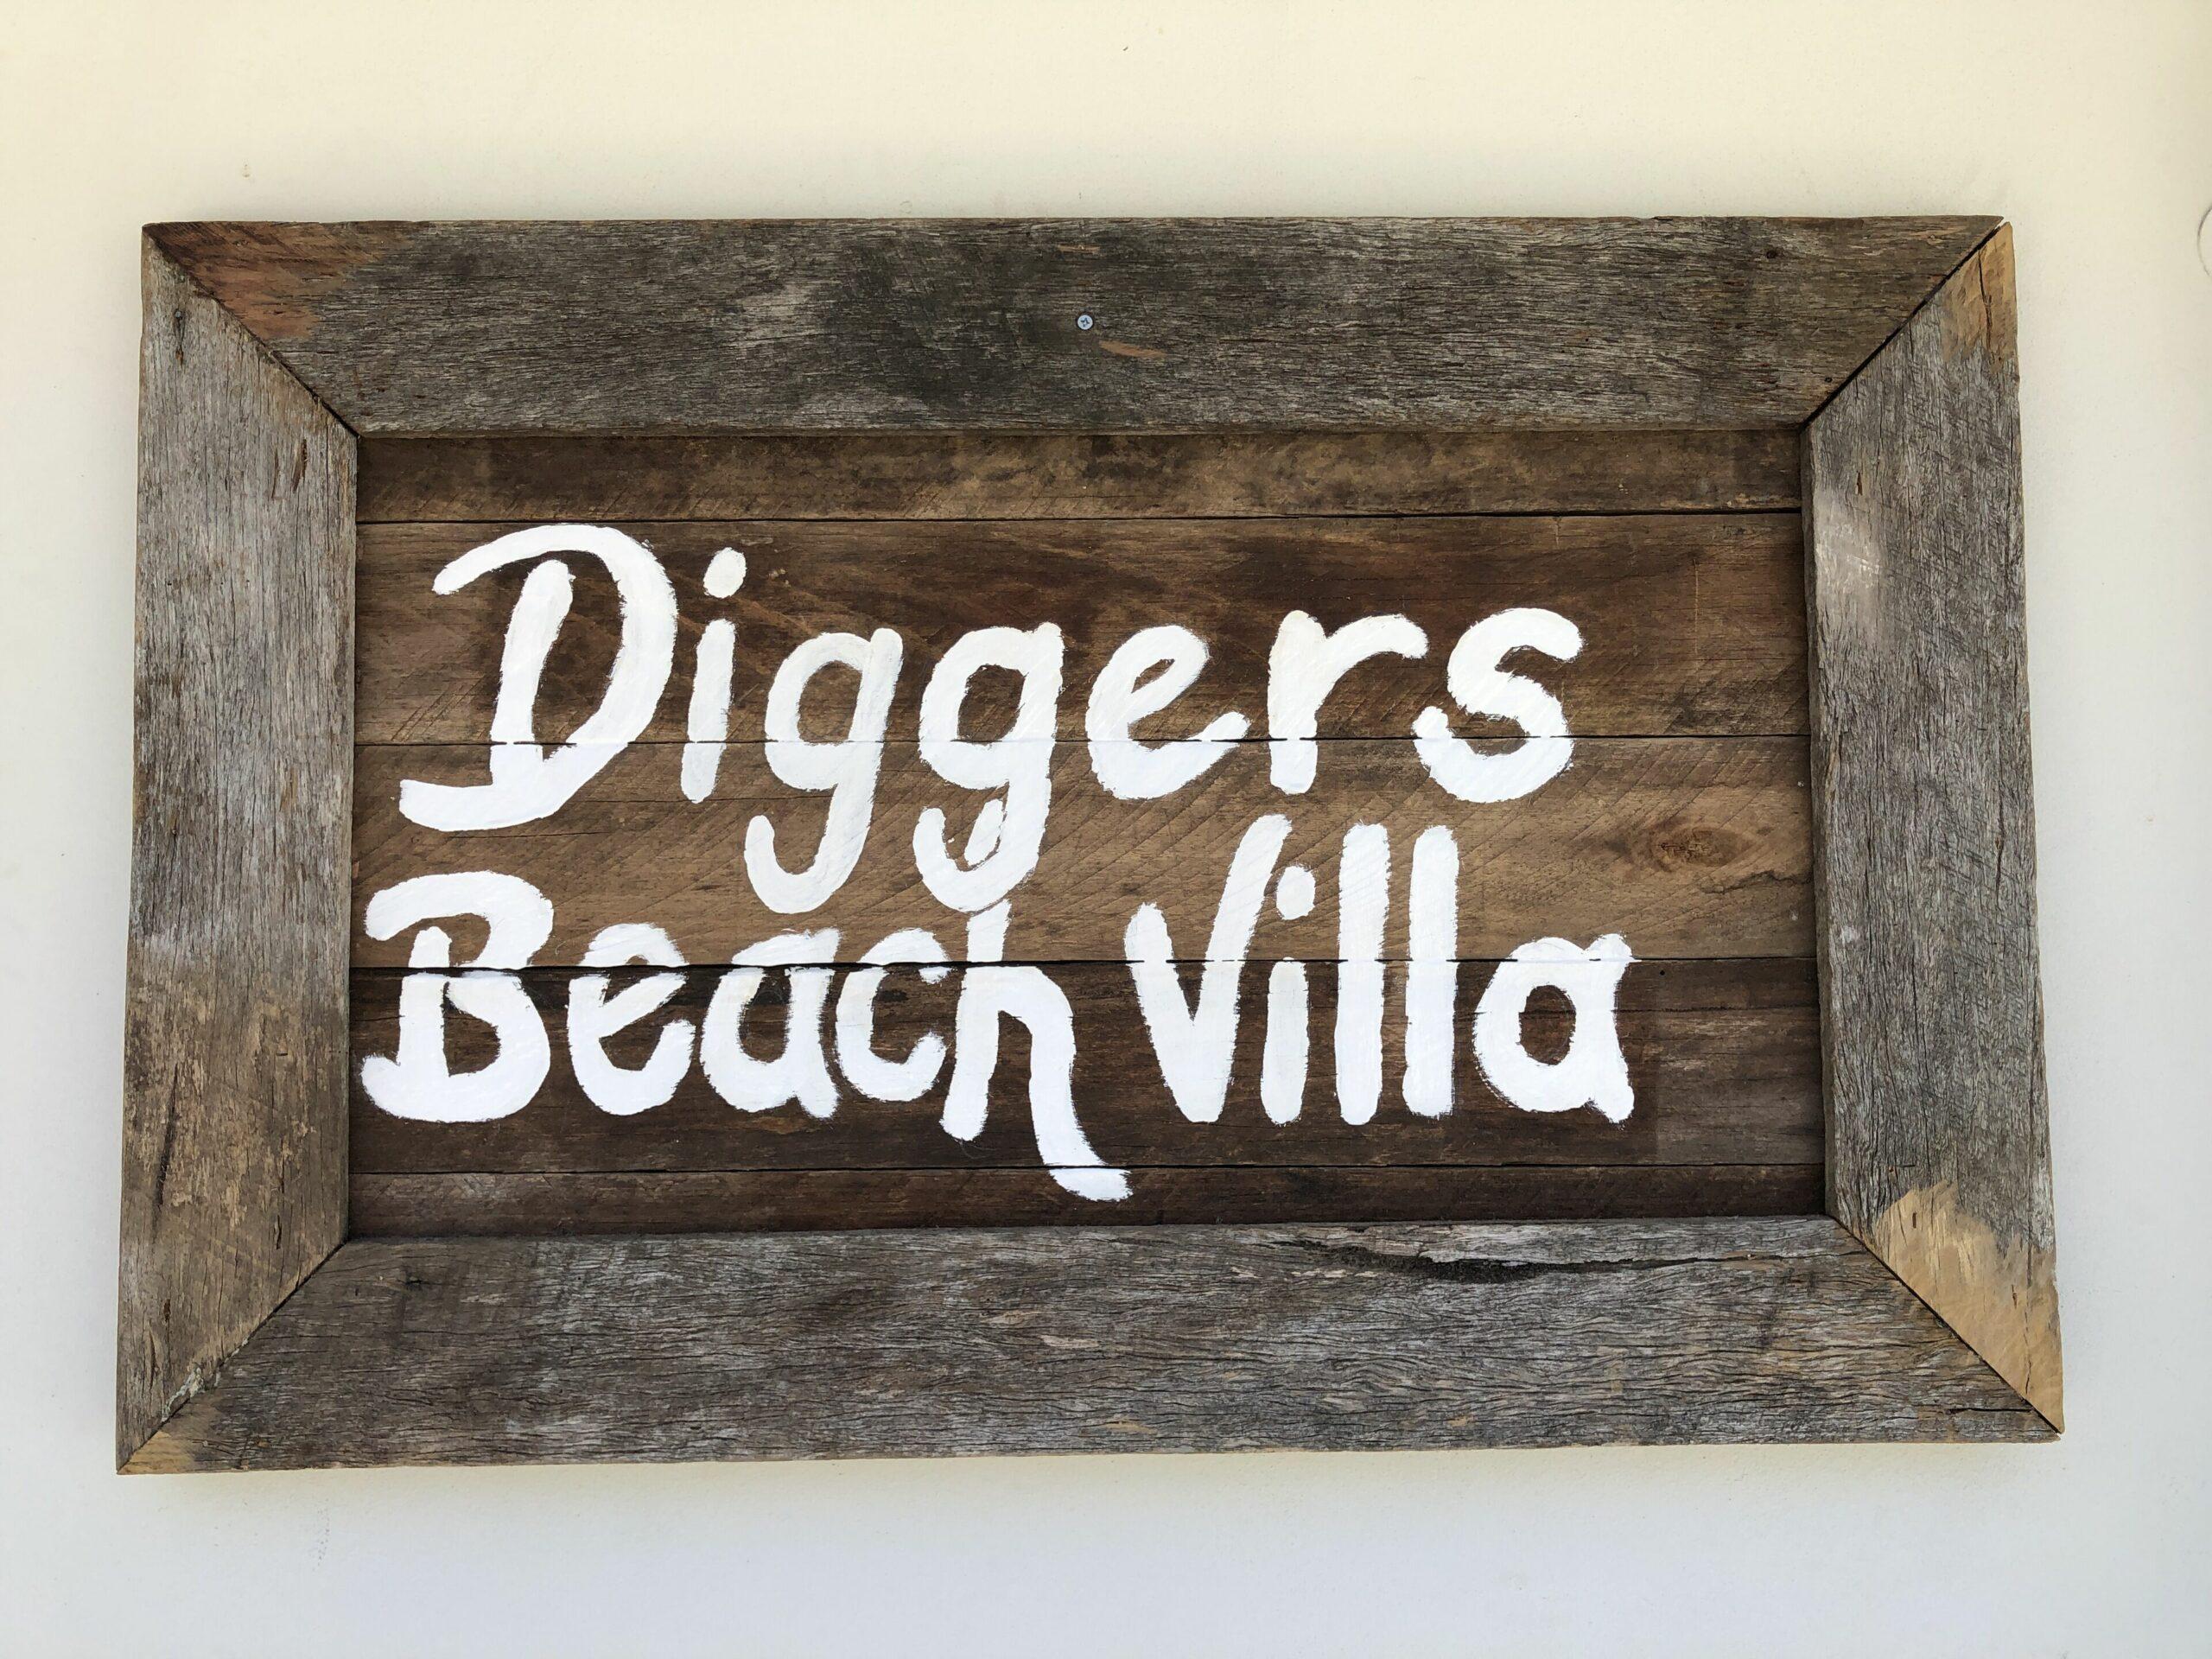 Diggers Beach Villa – 500m to Diggers Beach – 2 Bedroom